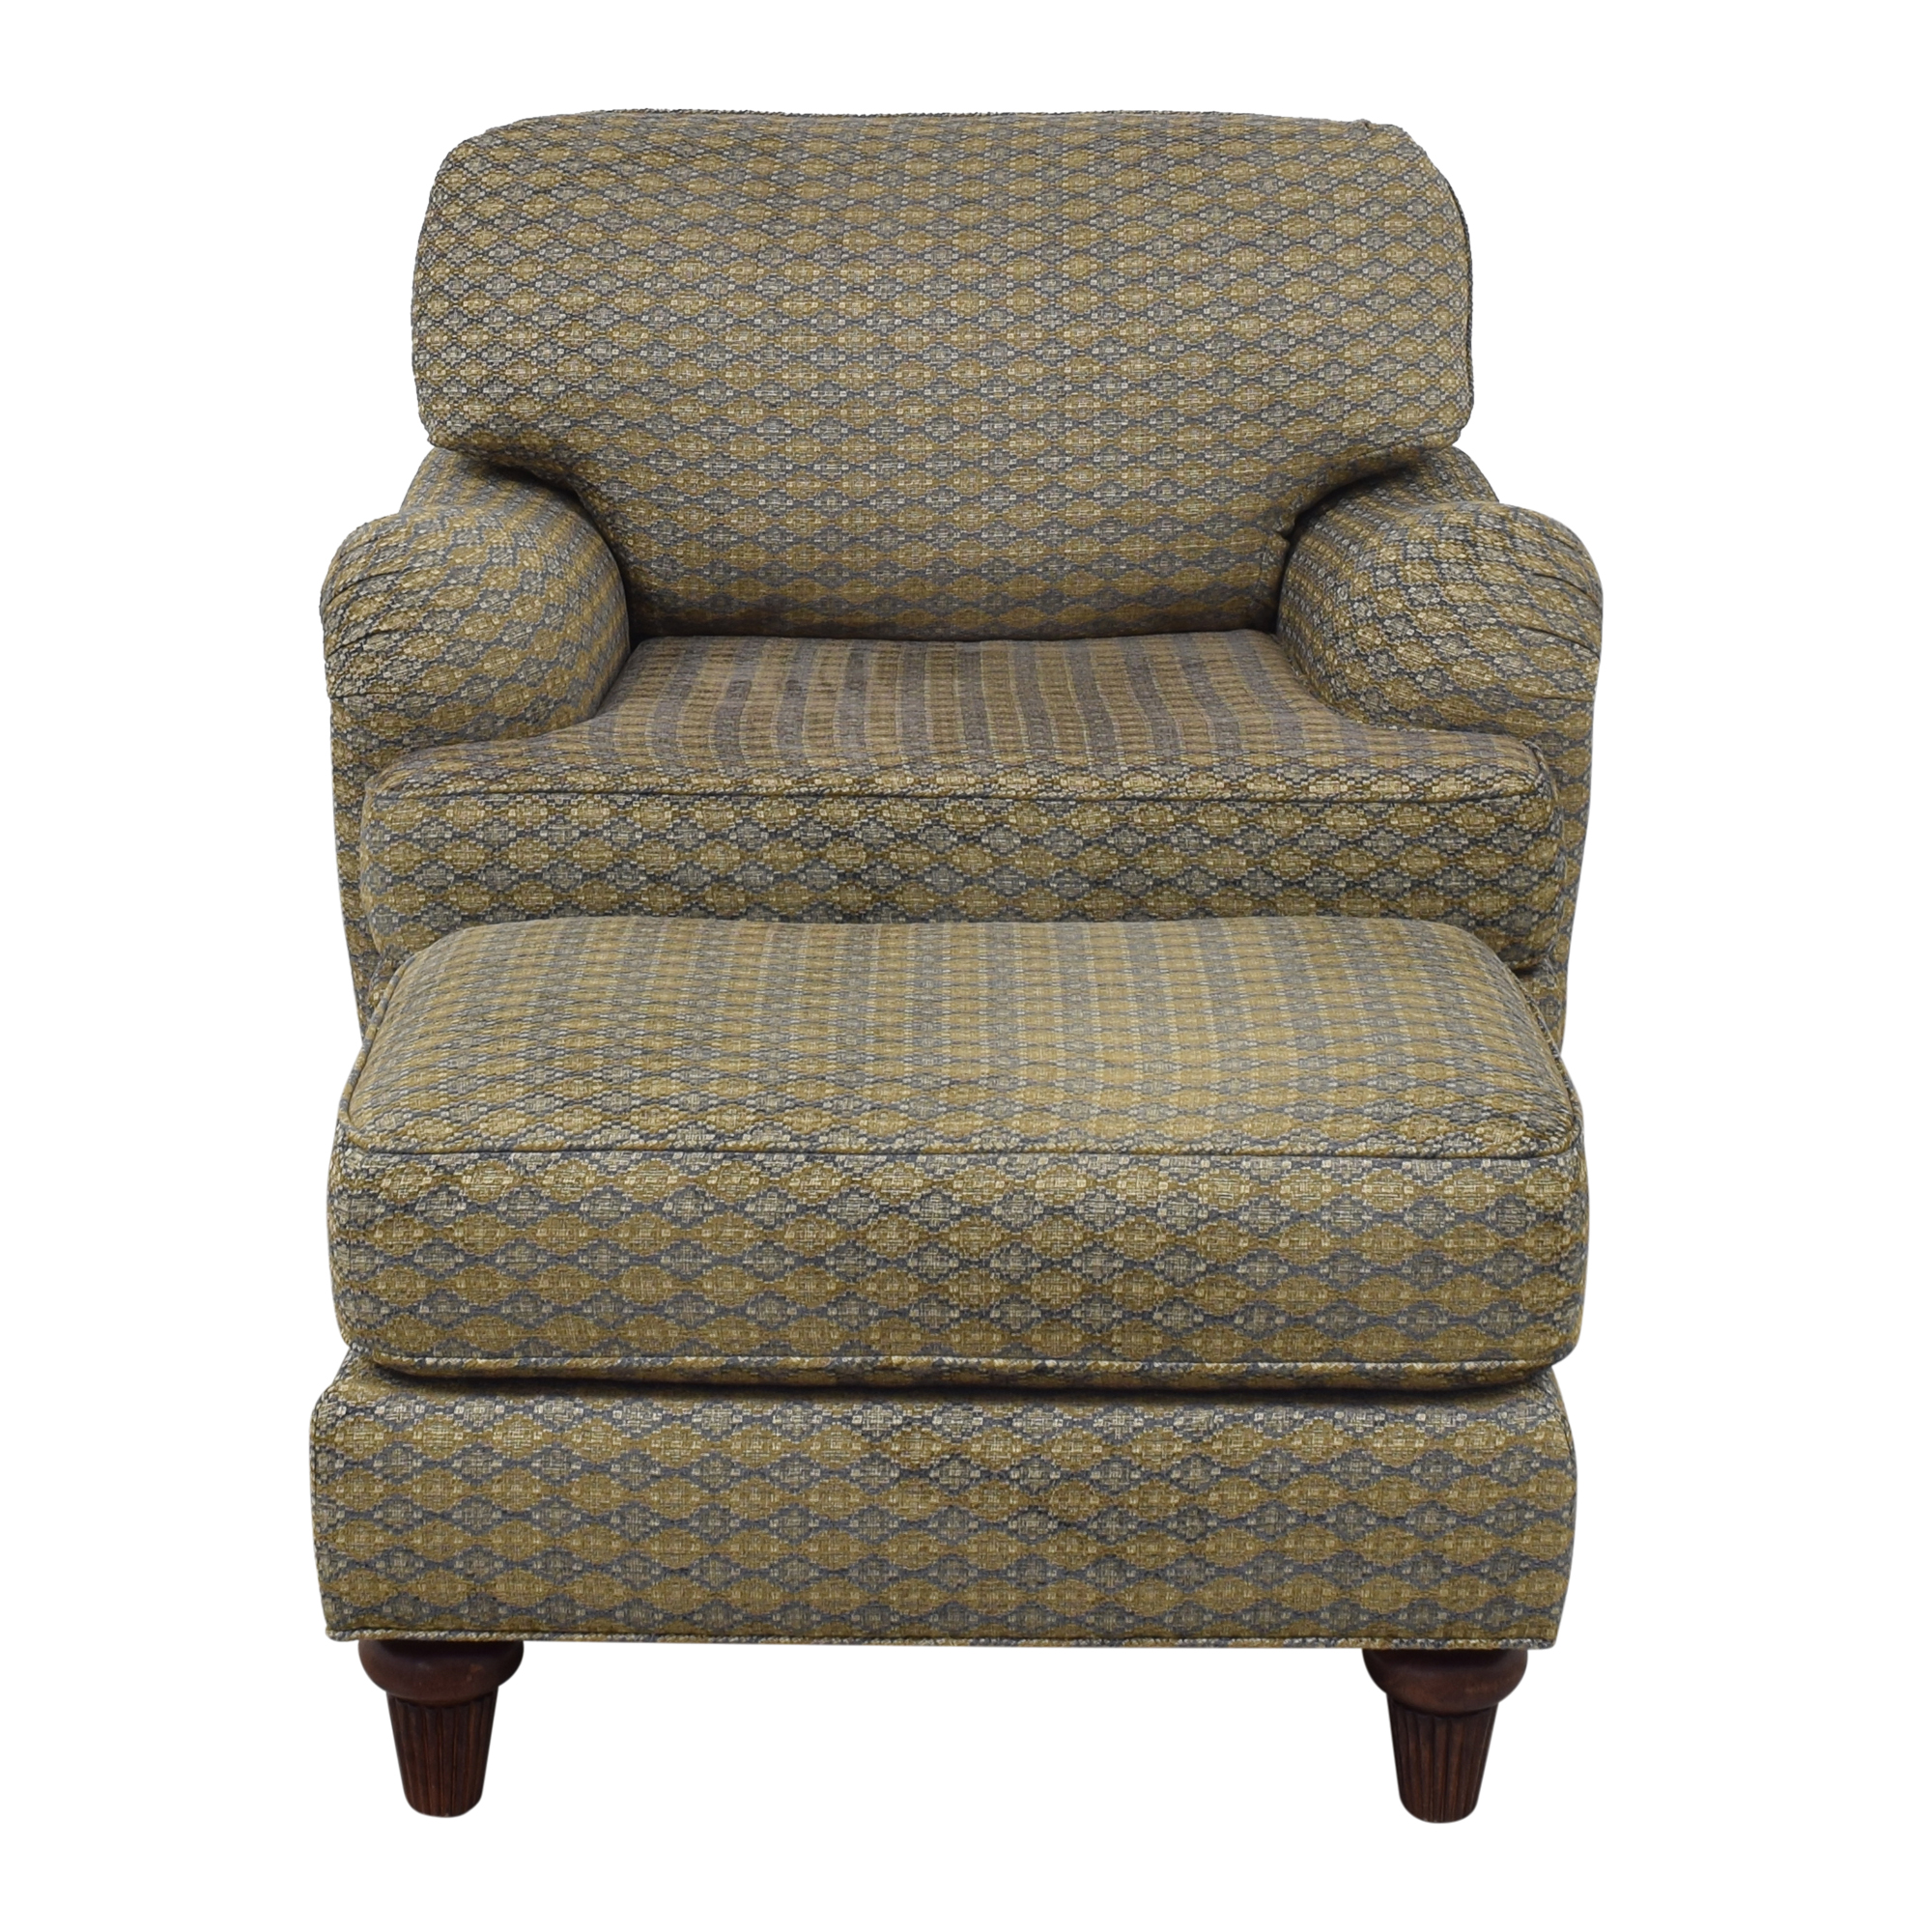 Norwalk Furniture Norwalk Furniture Club Chair with Ottoman on sale